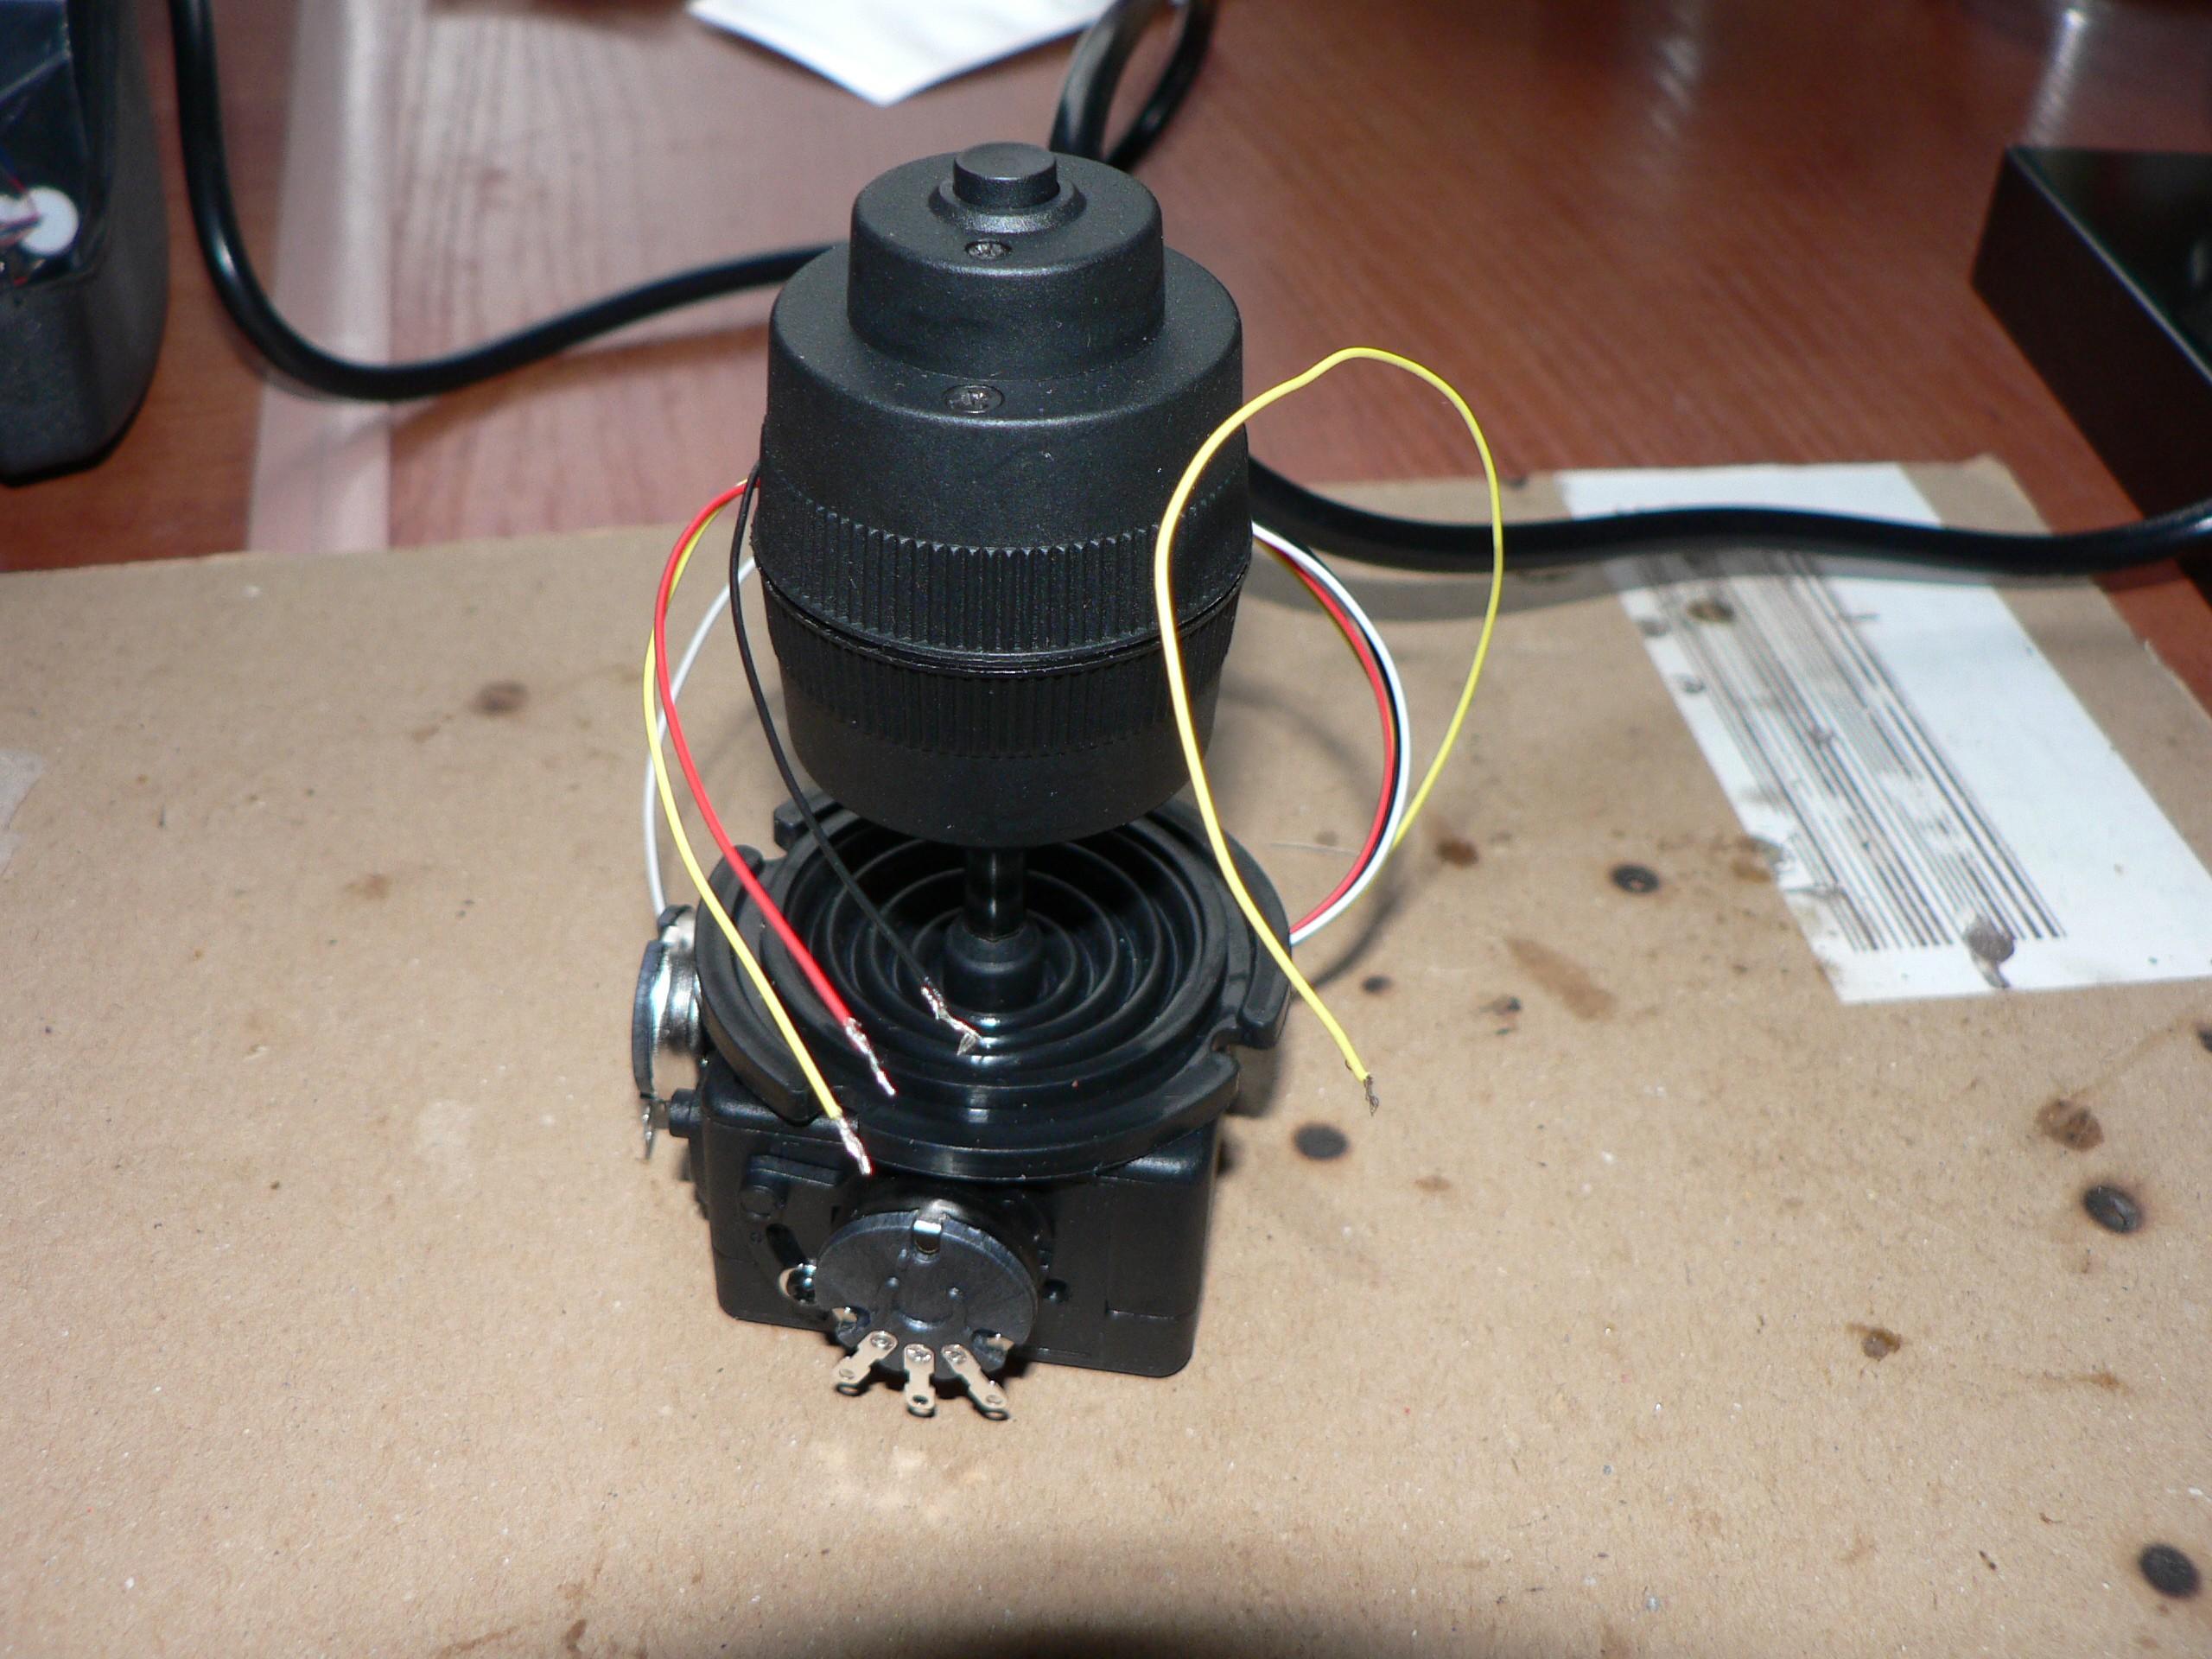 Another joystick update - 3 axis controller | Details | Hackaday io